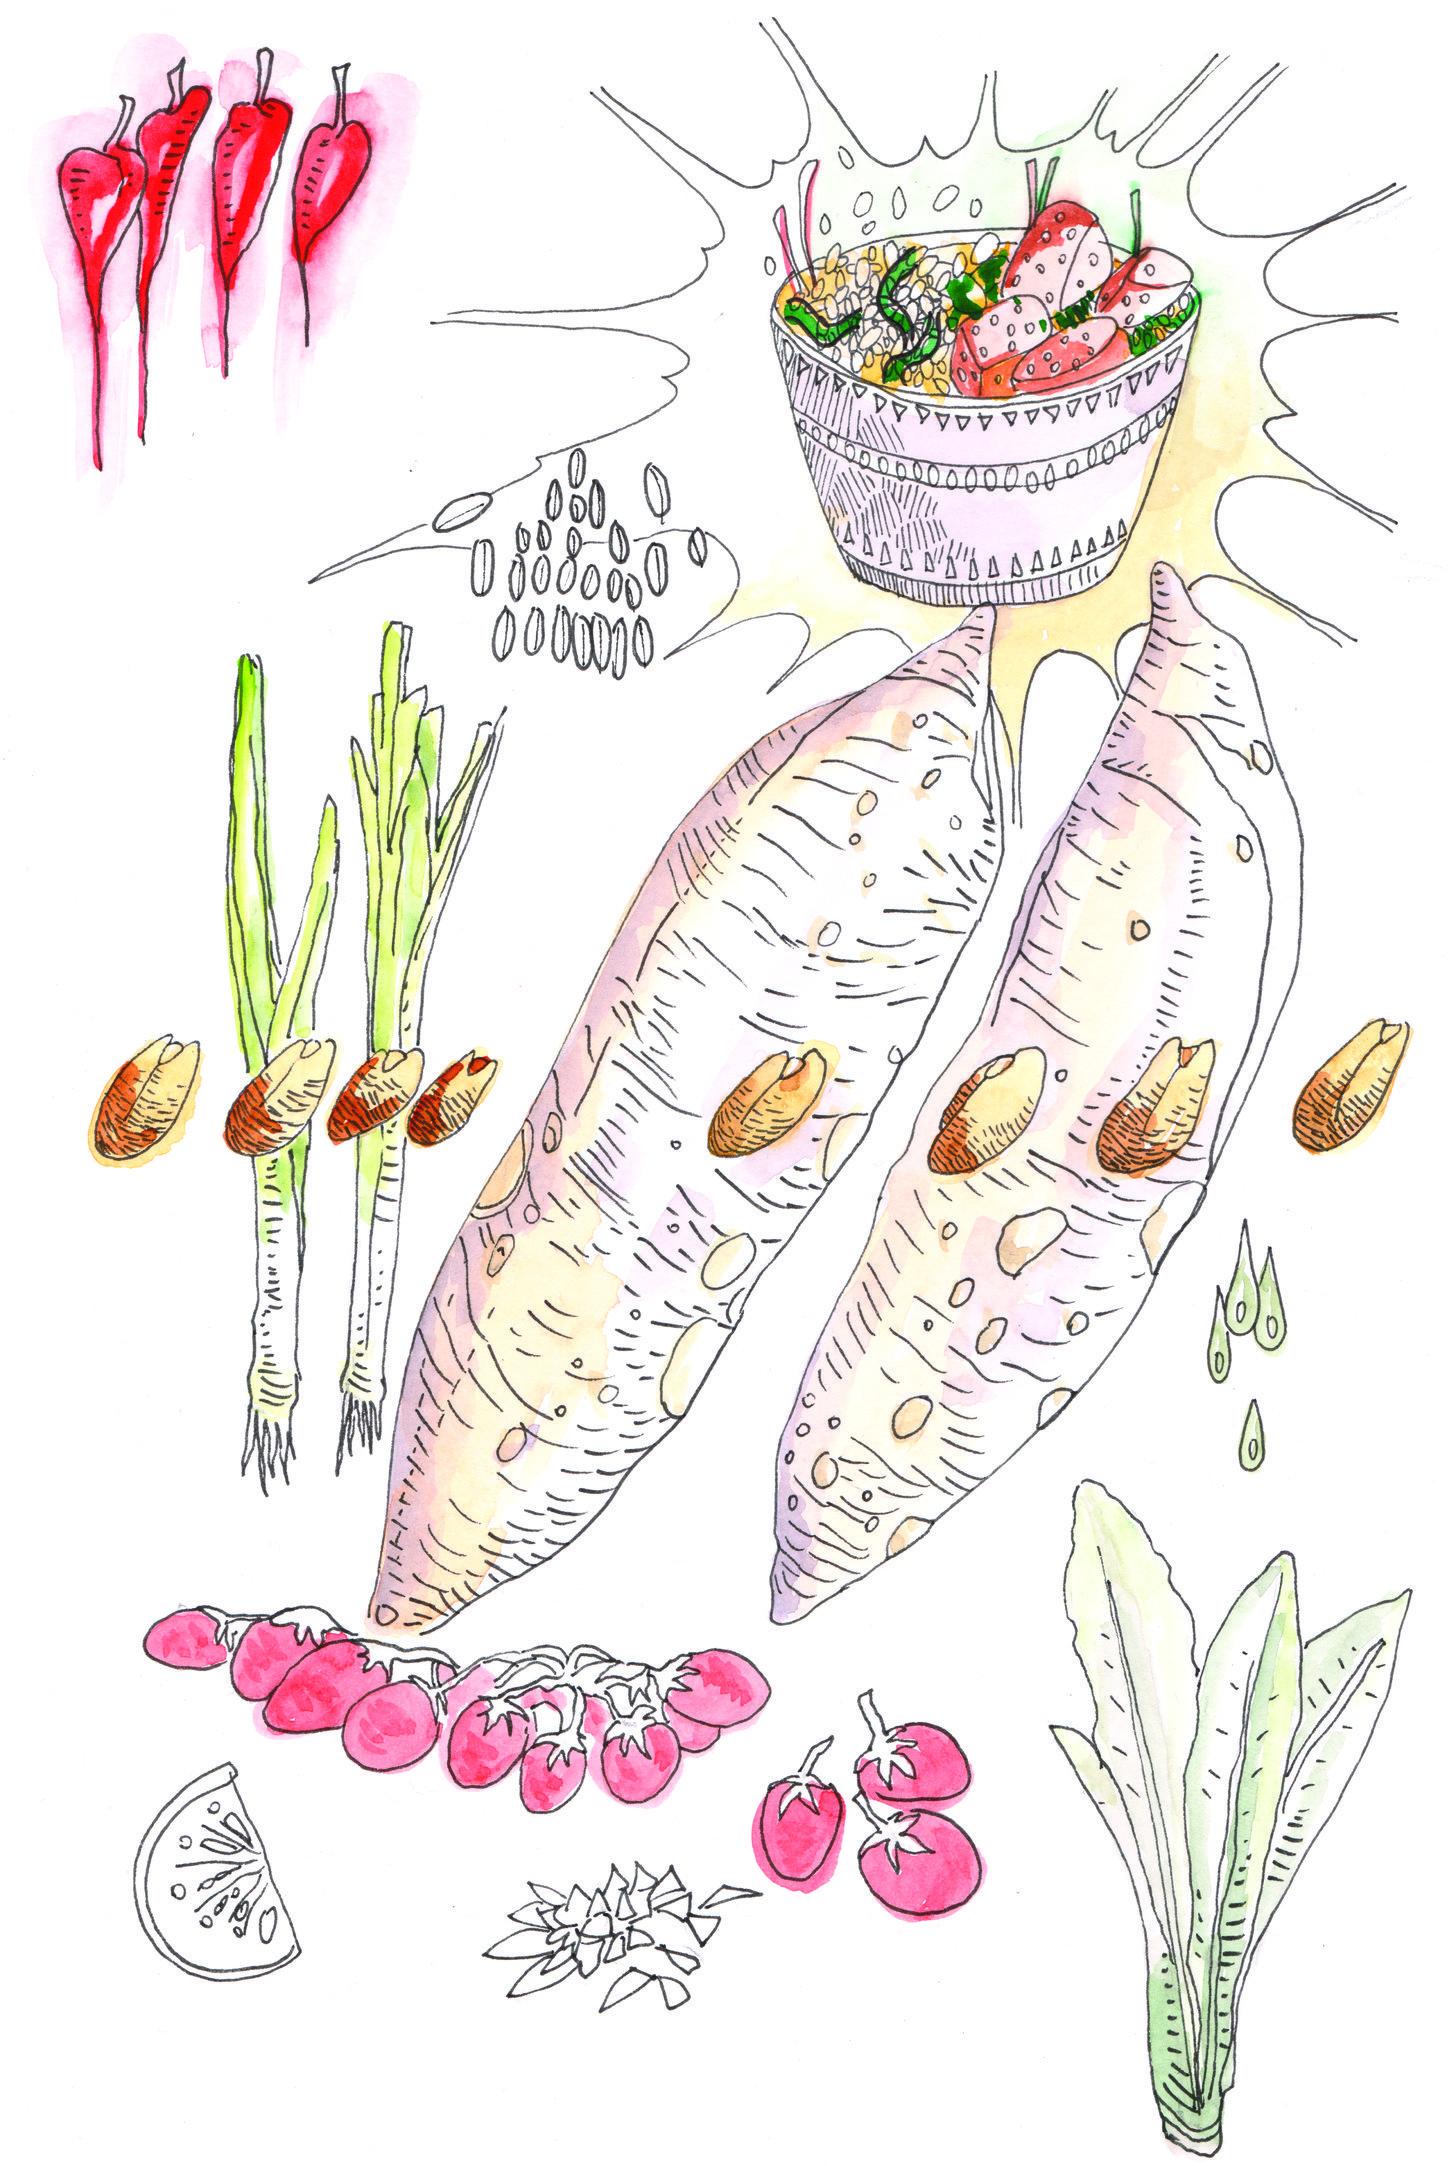 sweetpotatomangold.jpg